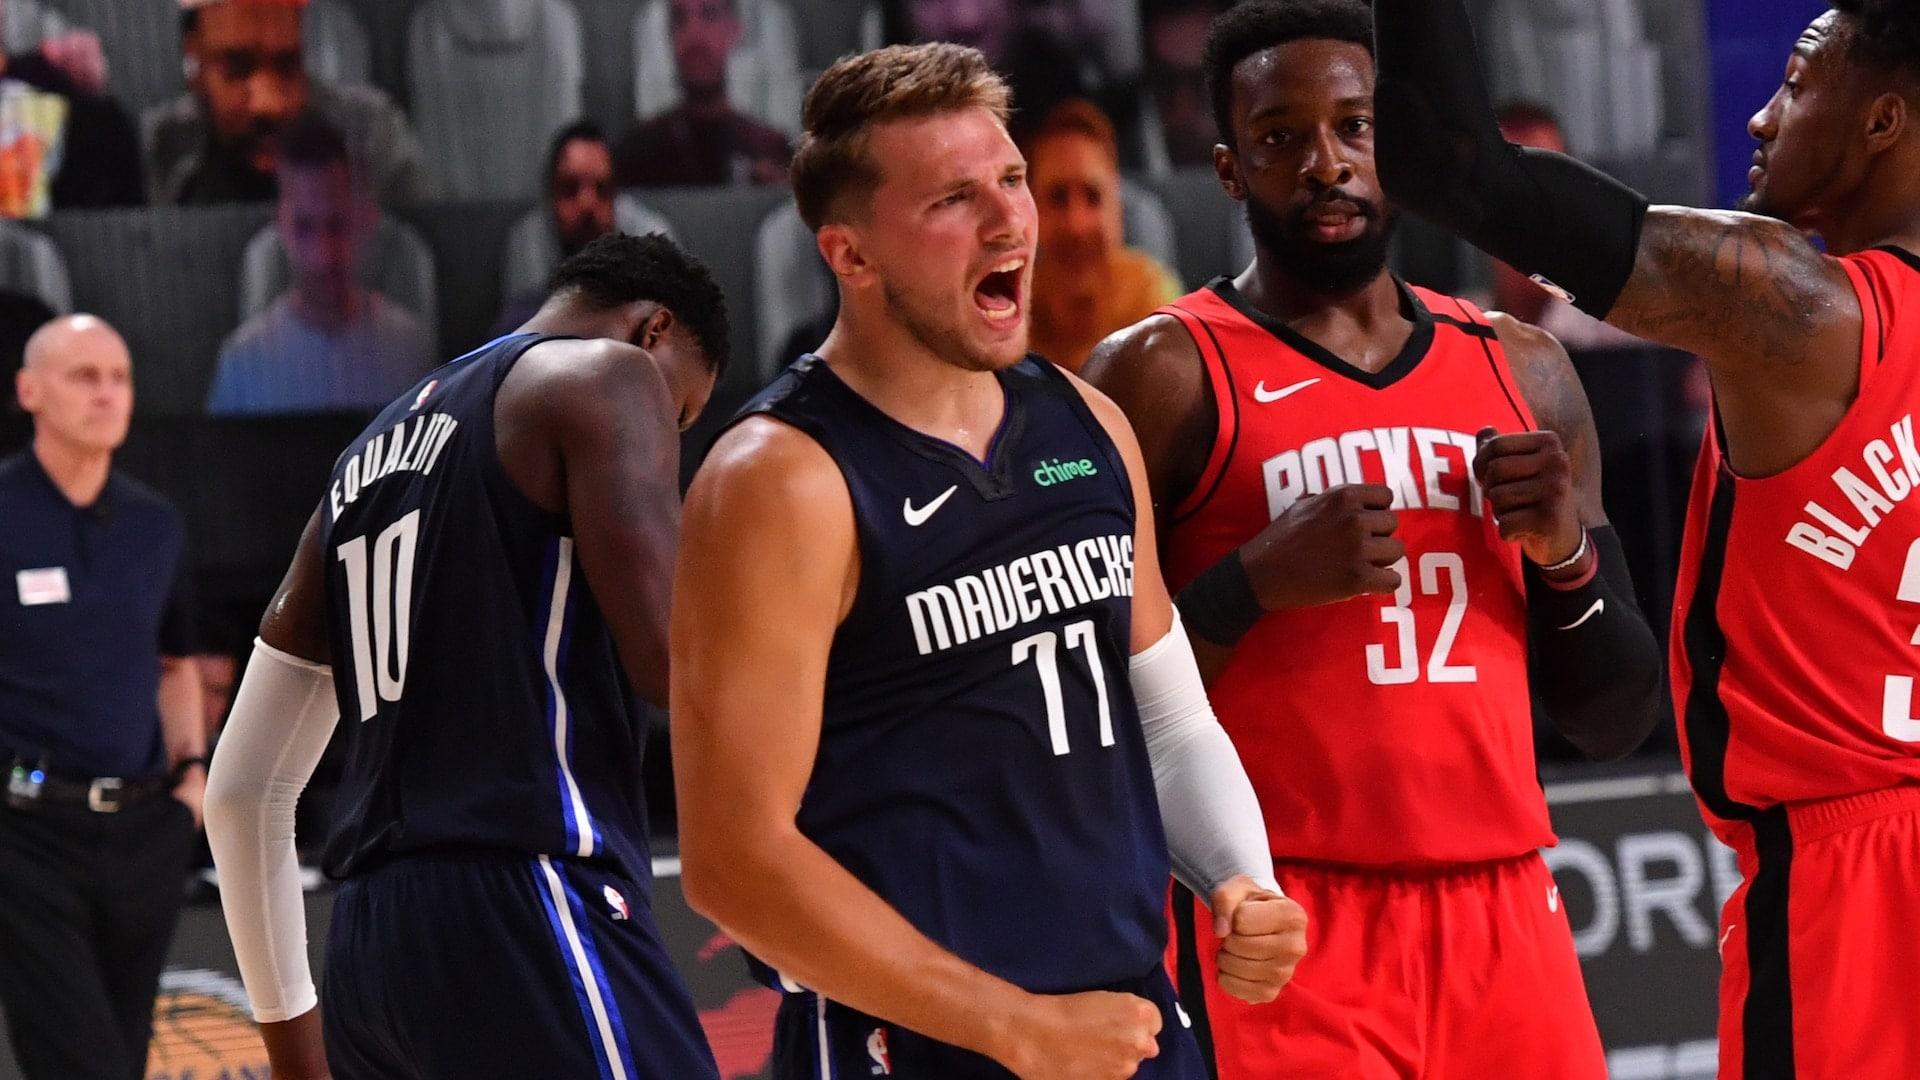 Mavericks clinch first playoff spot without Dirk since 1990